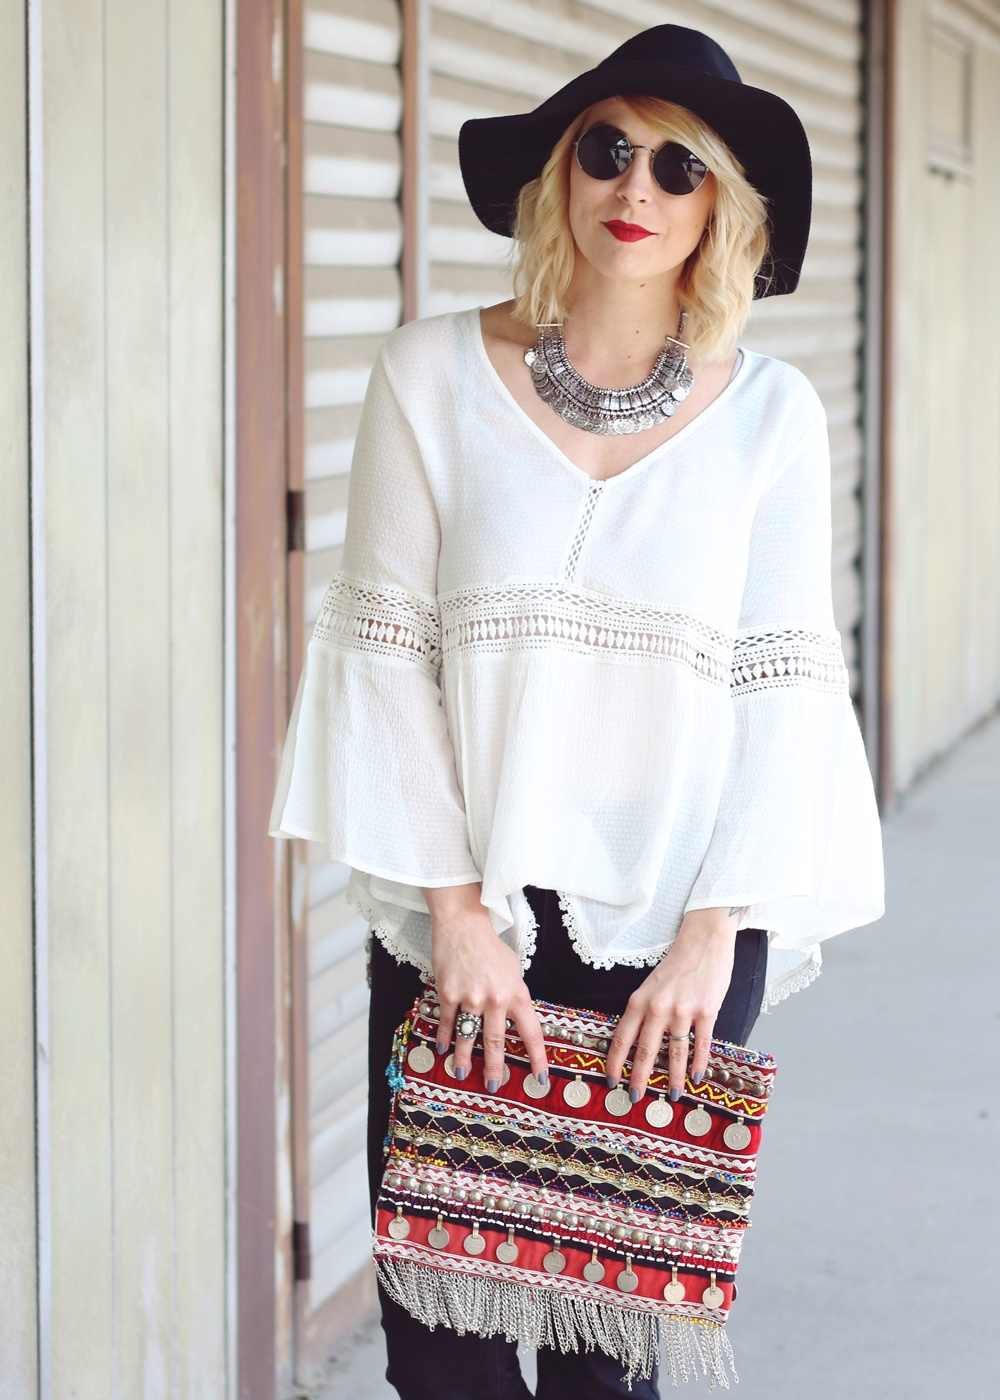 fashionblogger boholook outfit schlagjeans bluse trompeten rmel schlapphut ethnoclutch 19. Black Bedroom Furniture Sets. Home Design Ideas